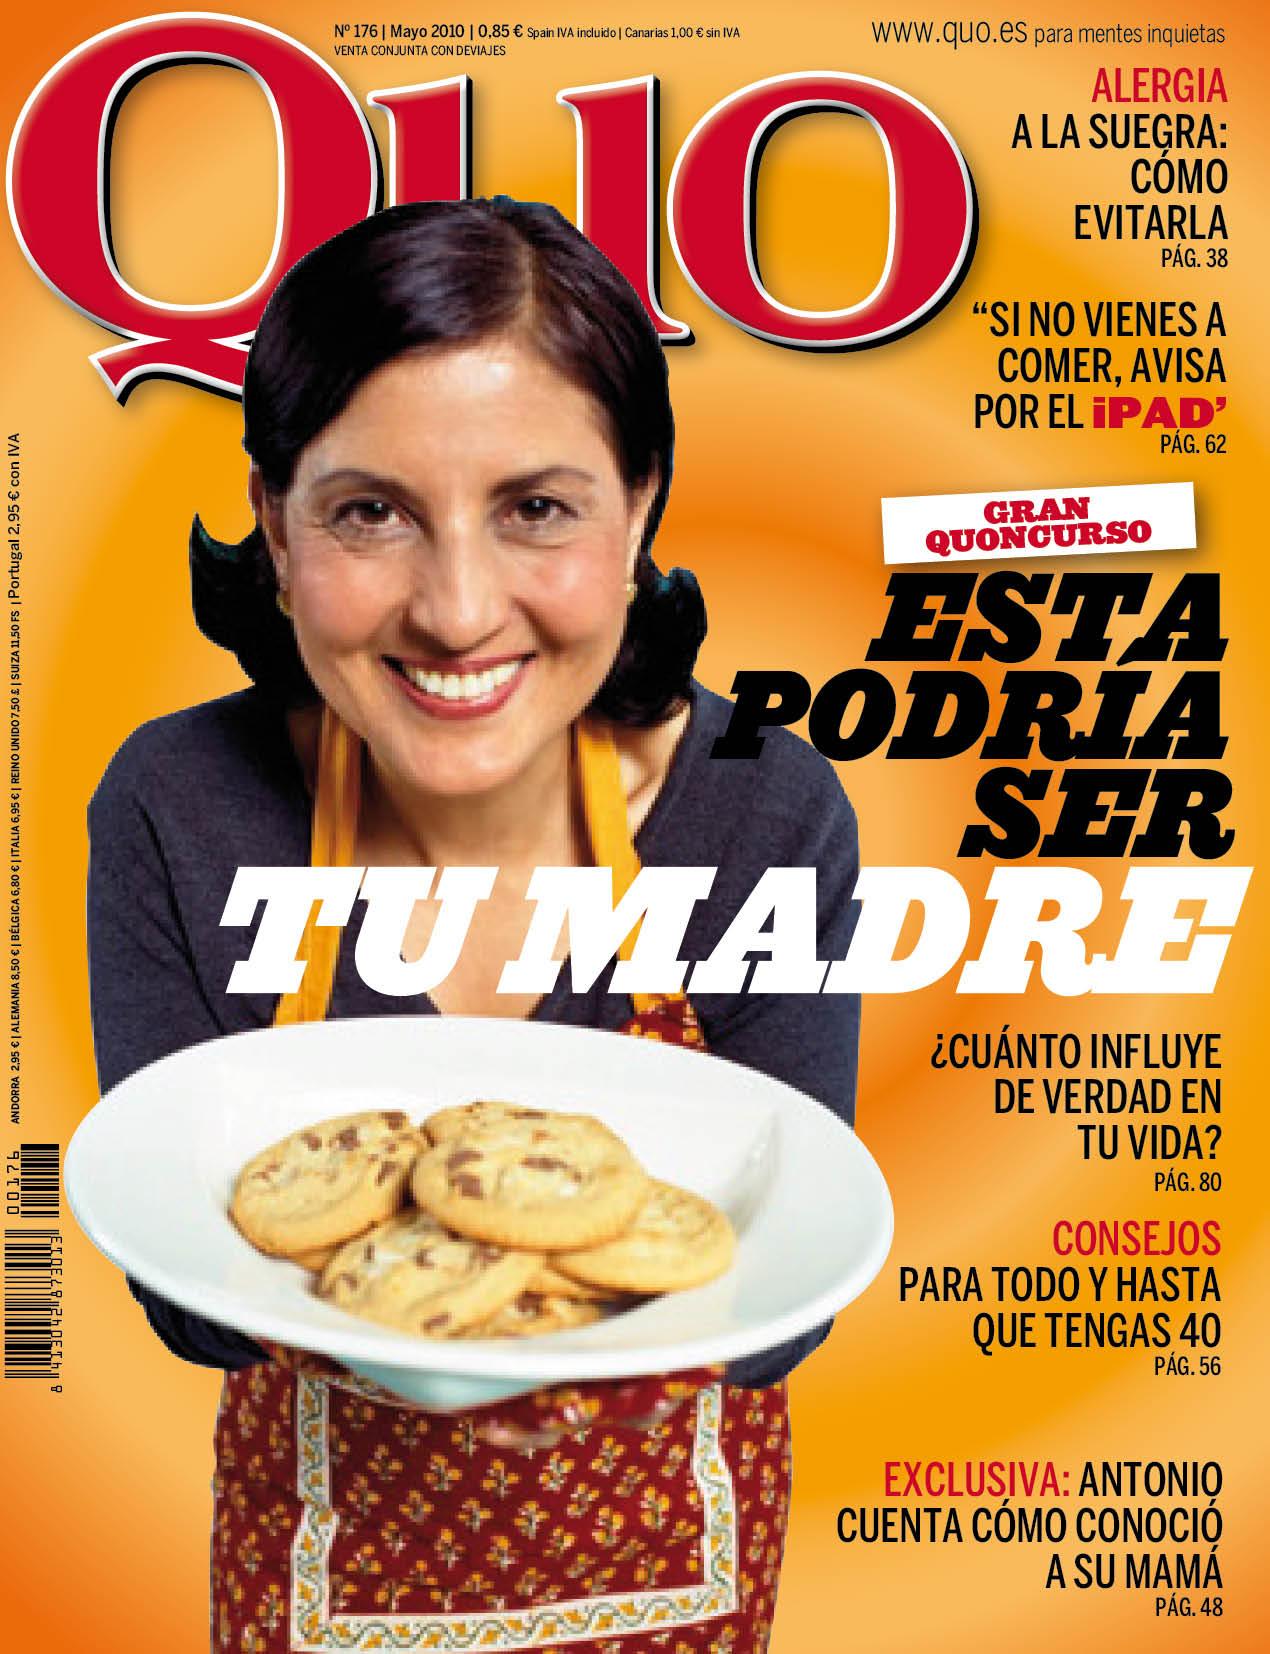 Tu madre en portada de QUO